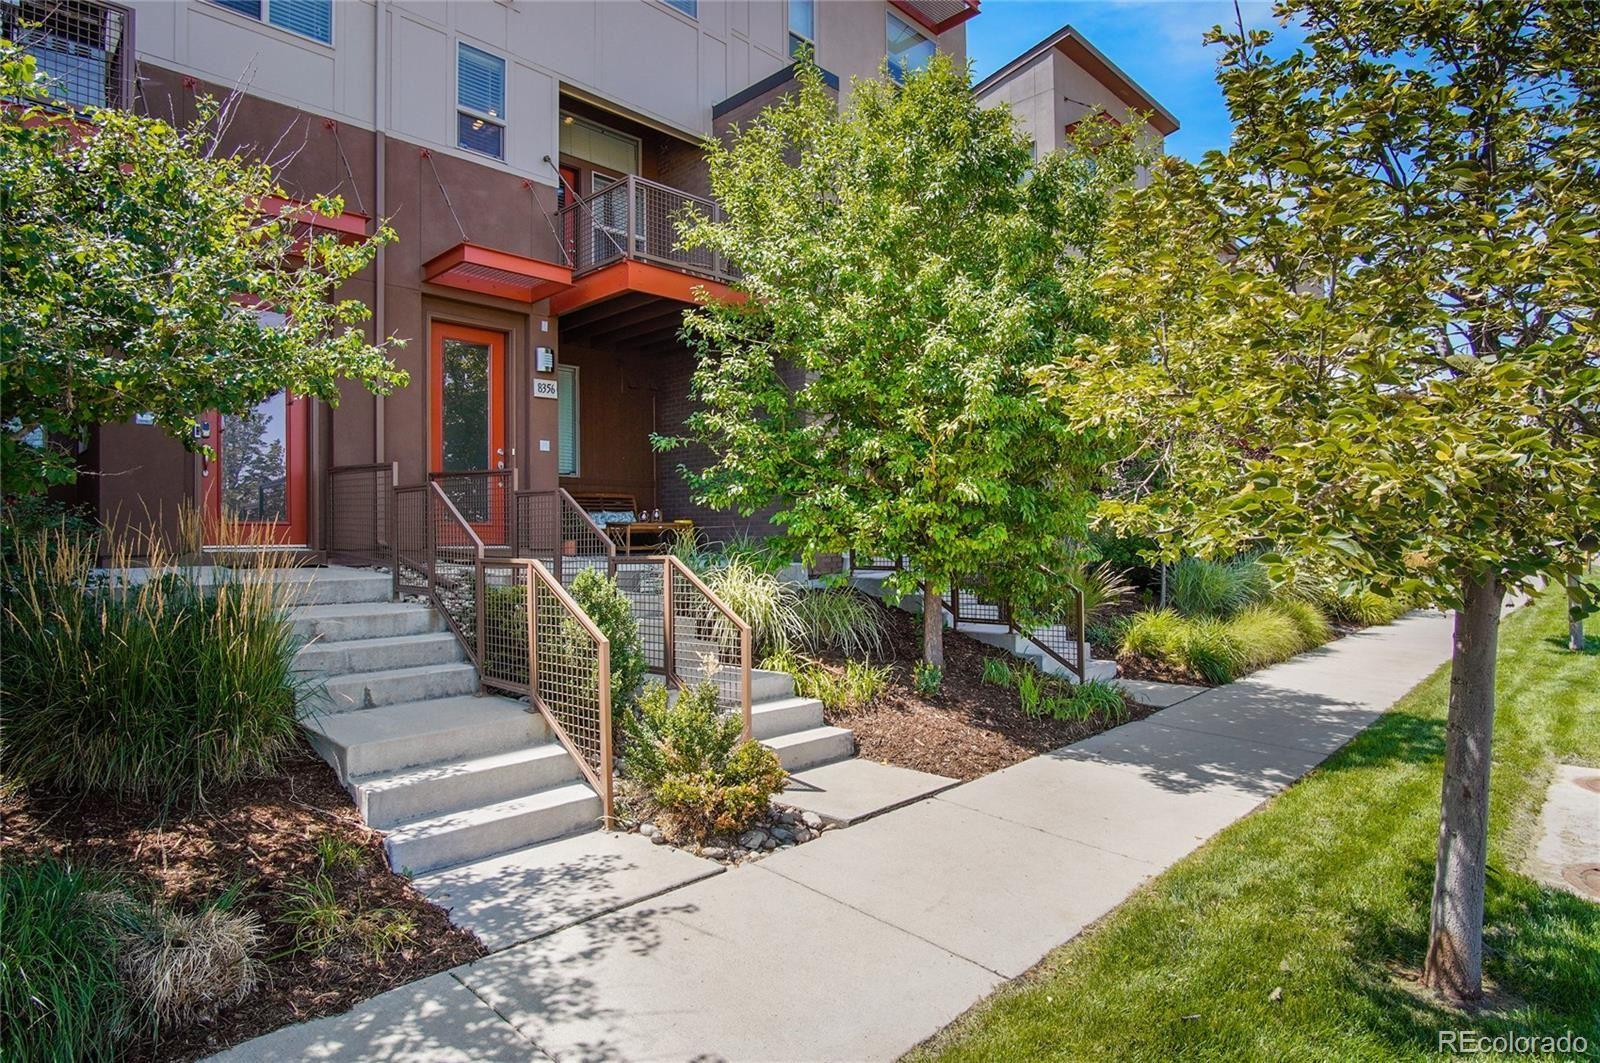 8356 E 35th Avenue, Denver, CO 80238 - #: 5294605